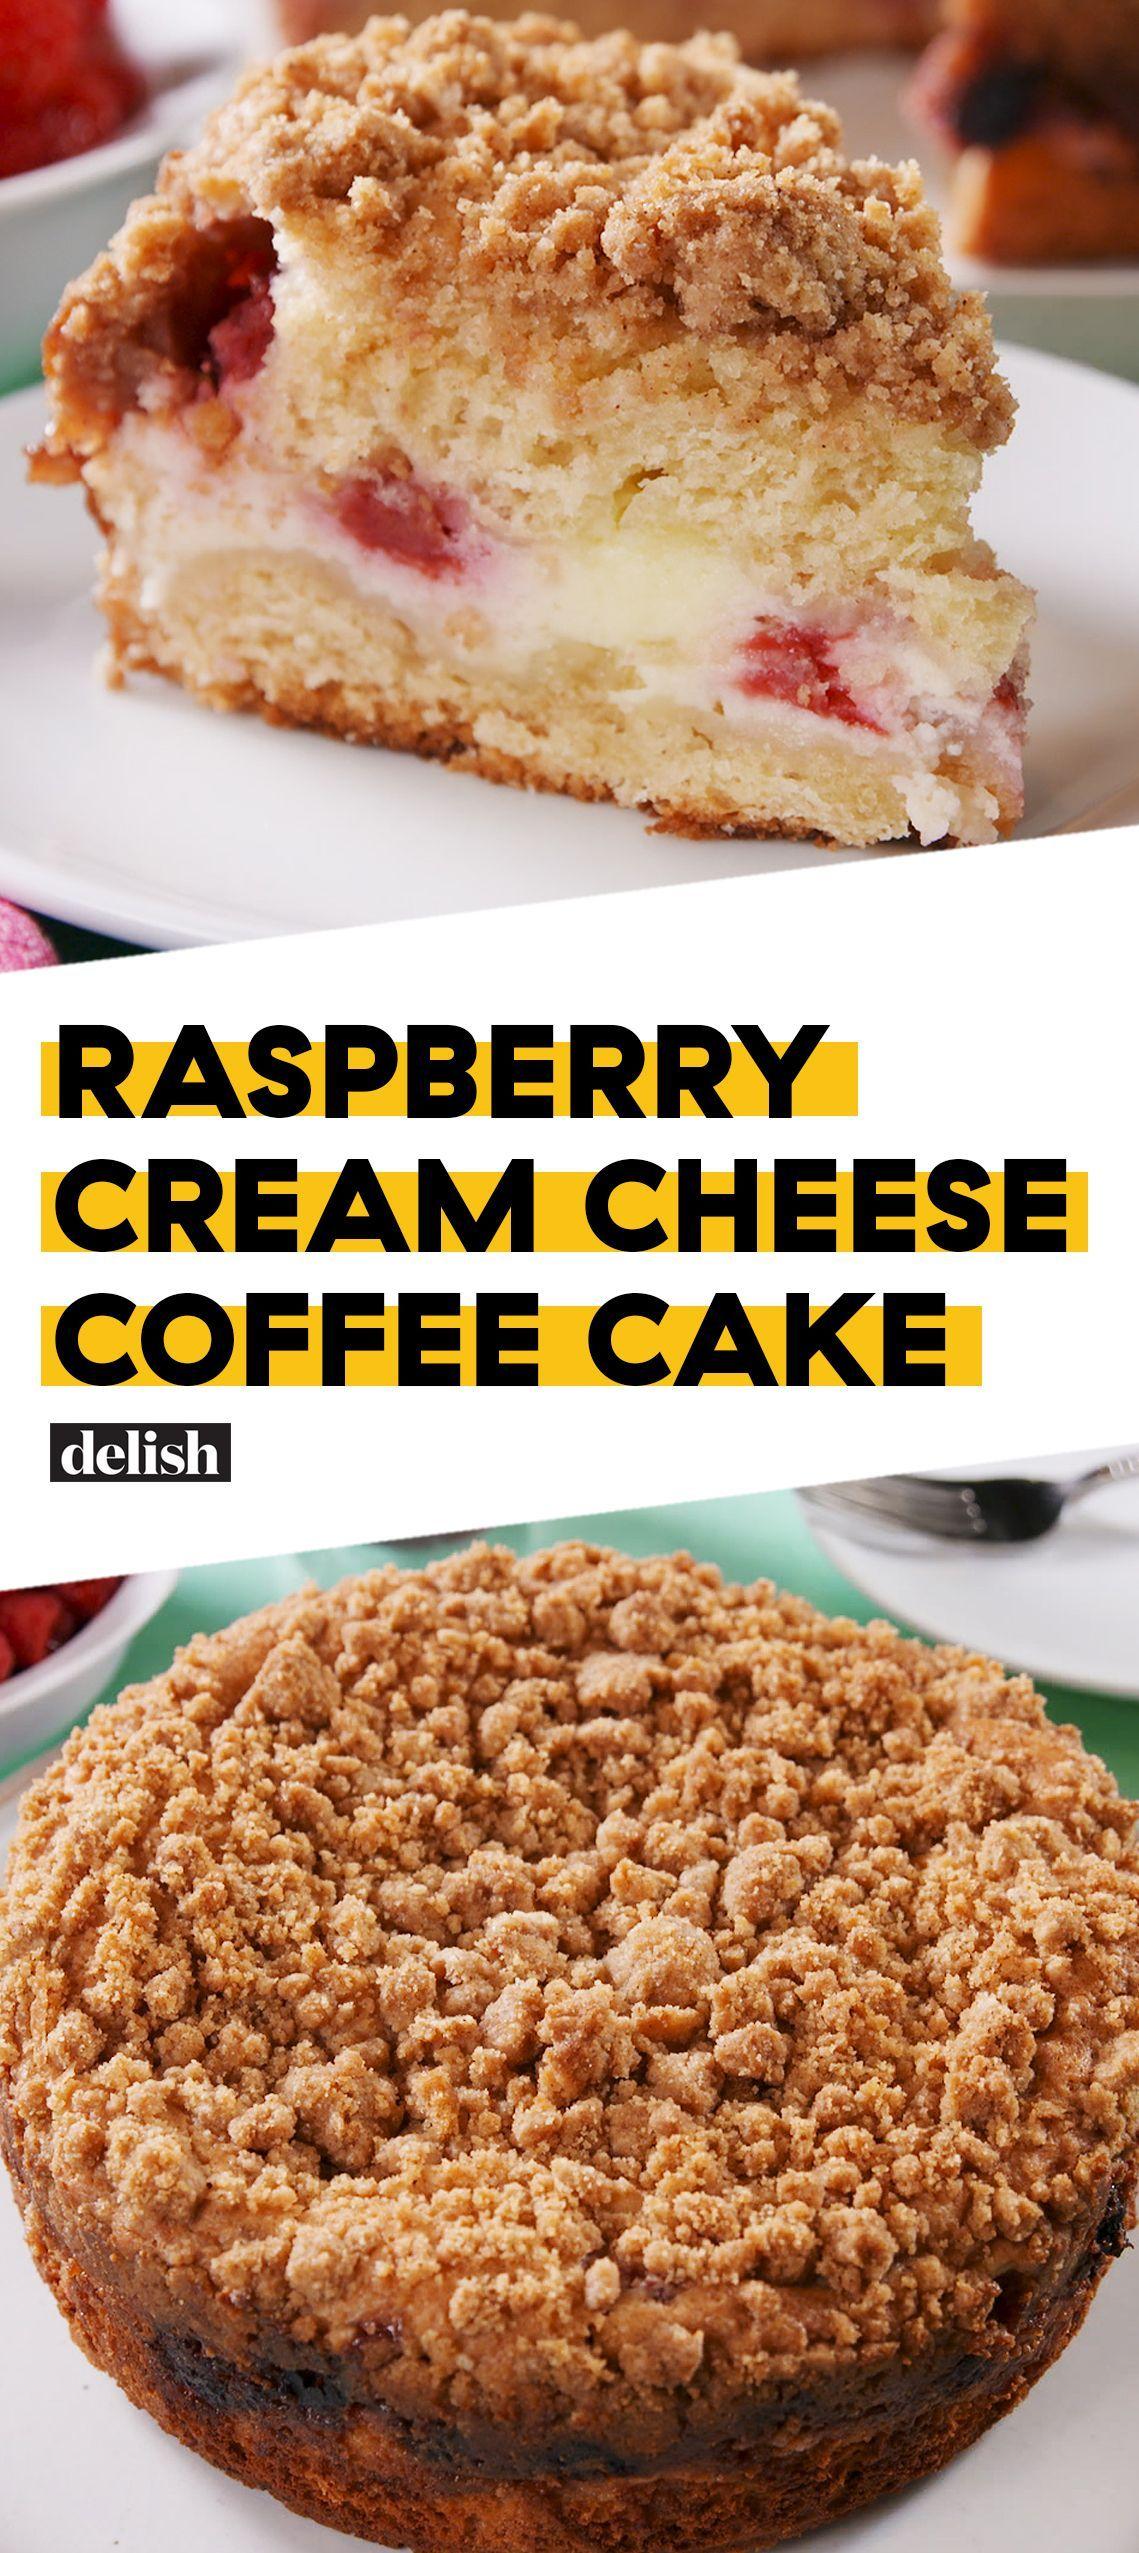 Raspberry Cream Cheese Coffee Cake Recipe Cream cheese